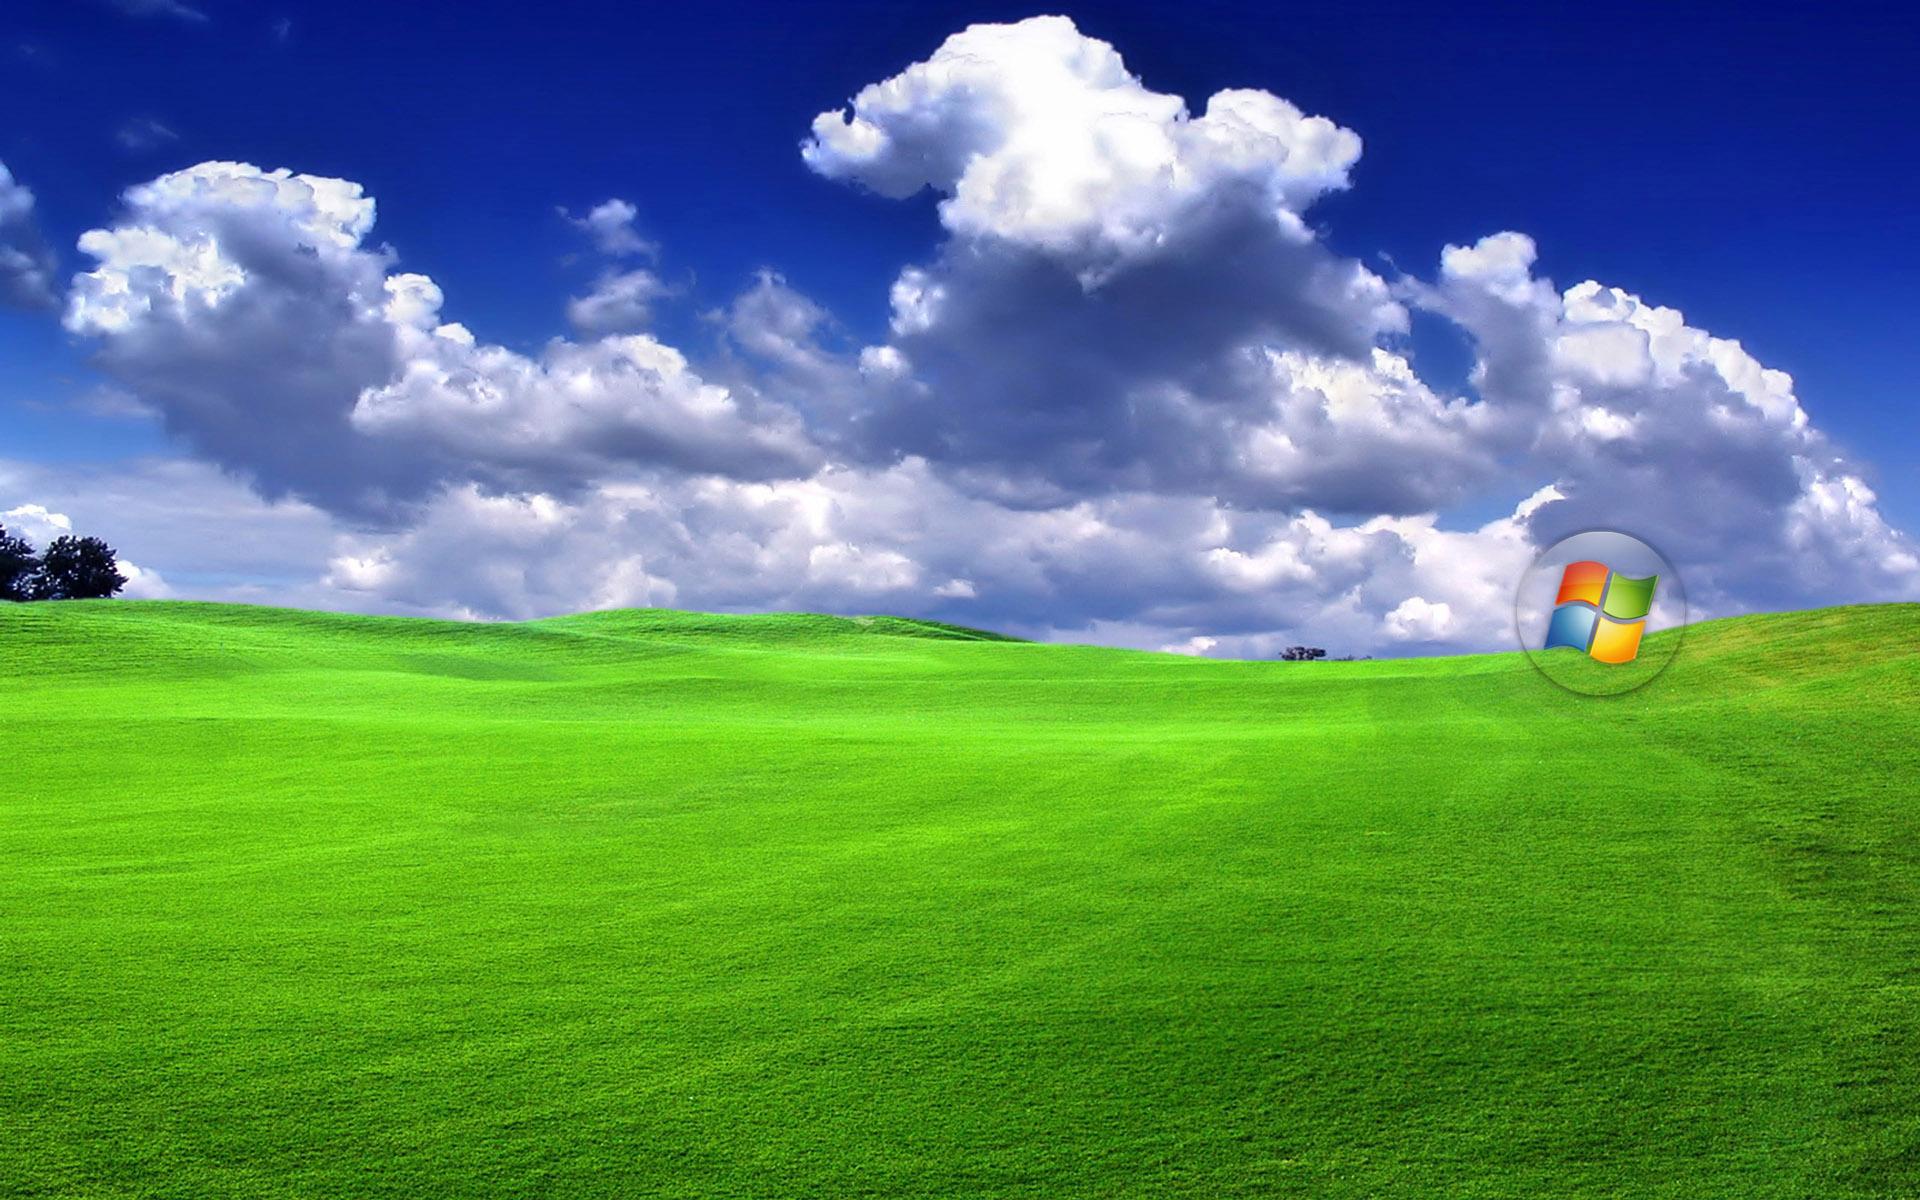 Pc Desktop Background Images - WallpaperSafari